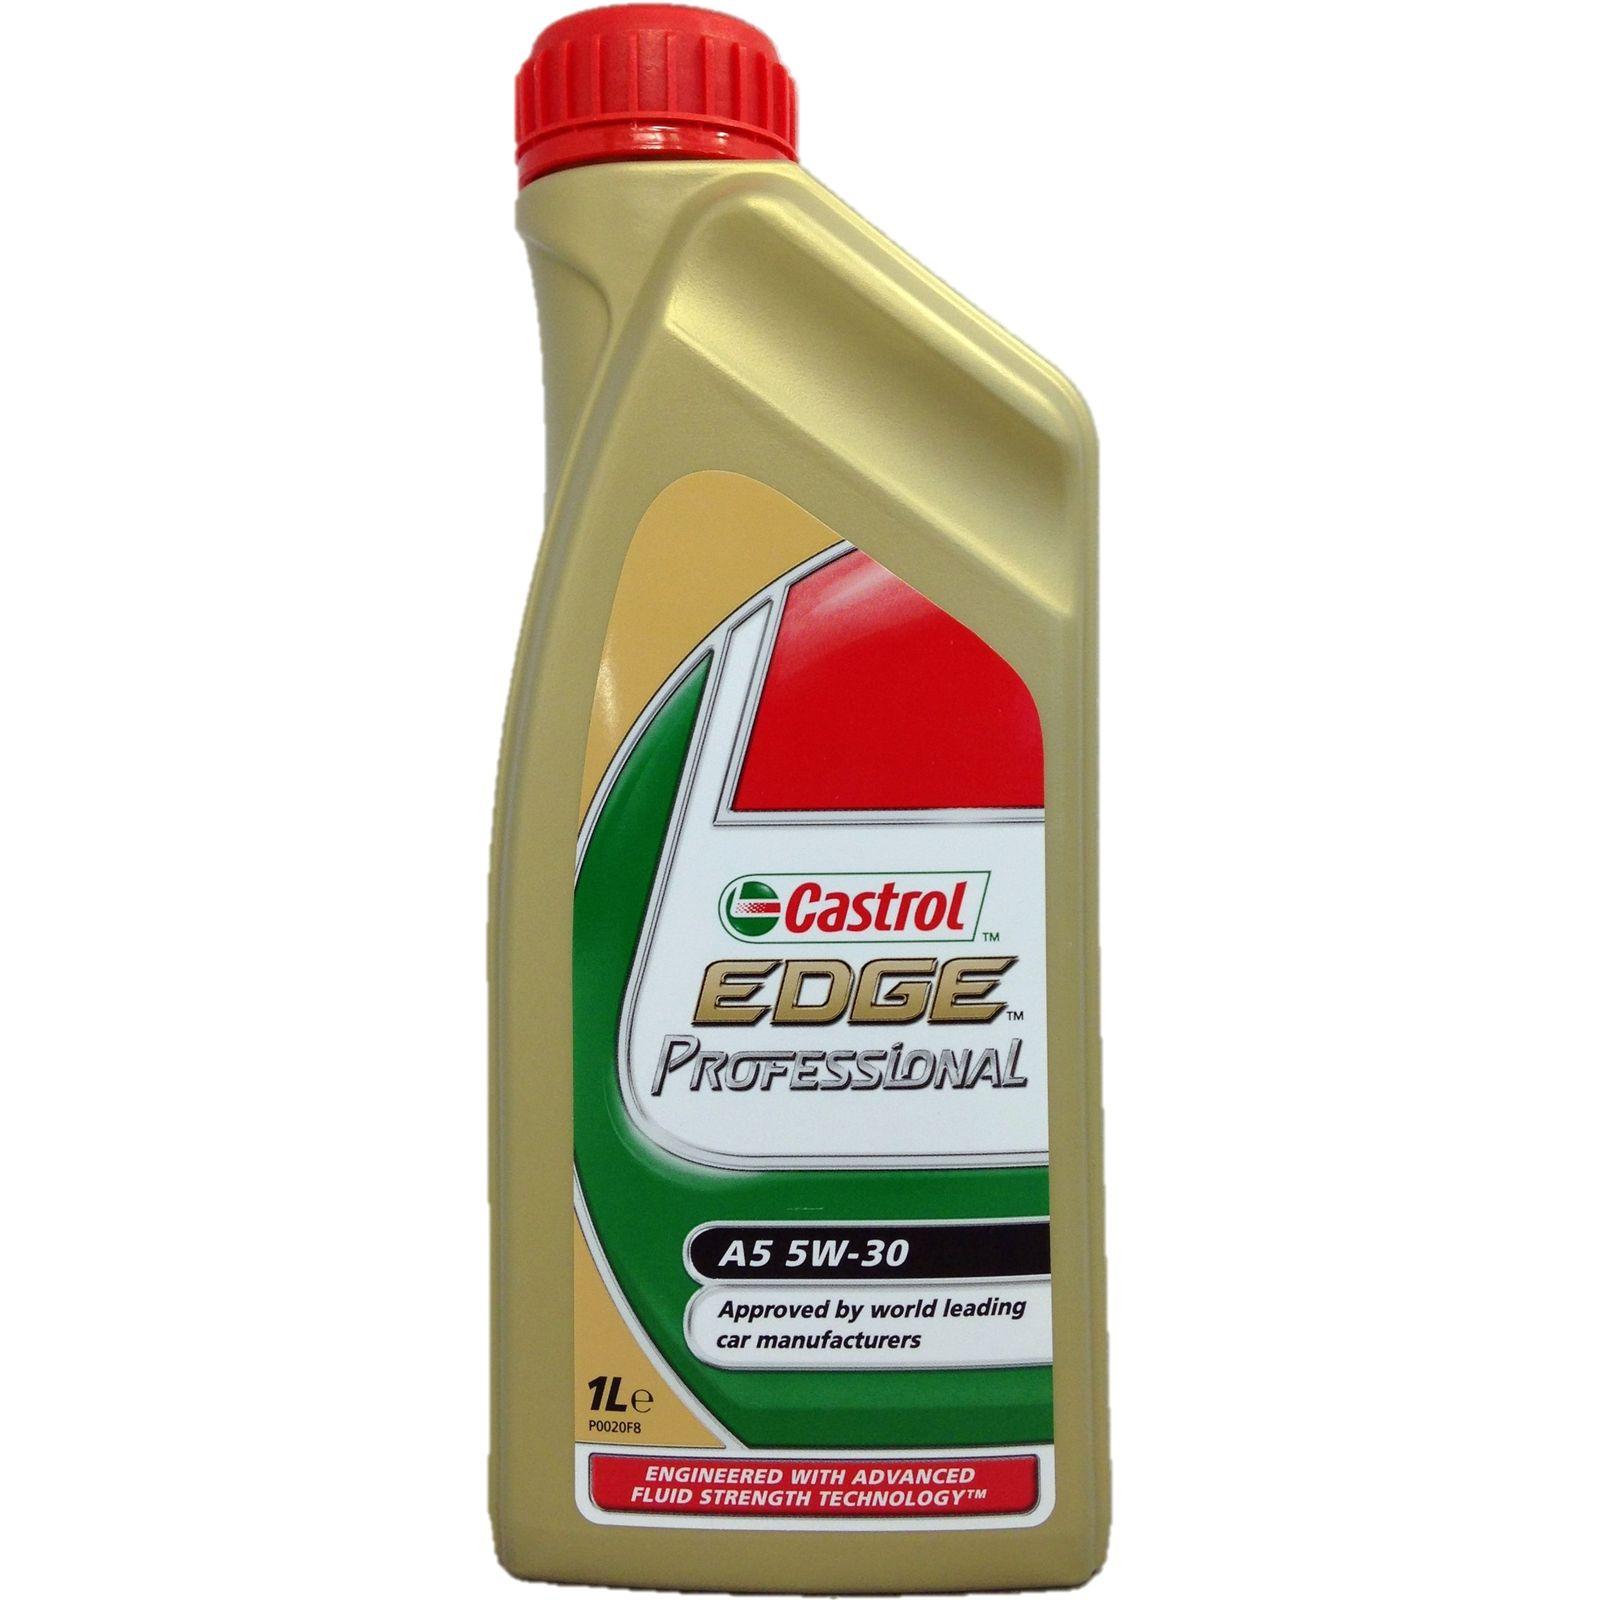 1 Liter Castrol EDGE Professional 5W-30 A5